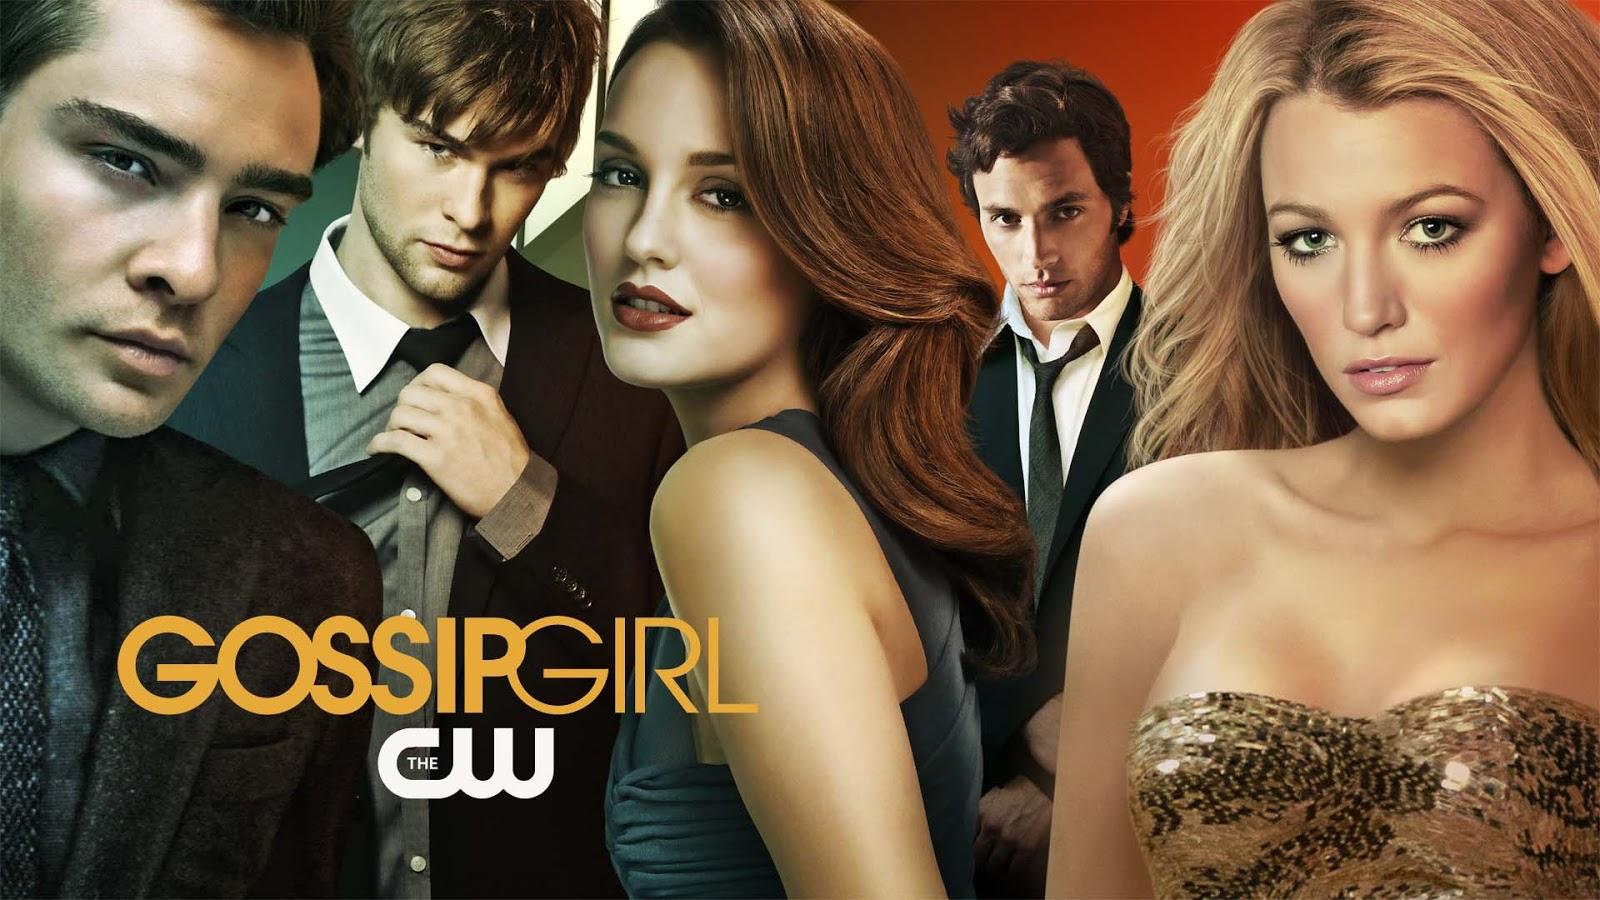 gossip girl 1 temporada dublada rmvb